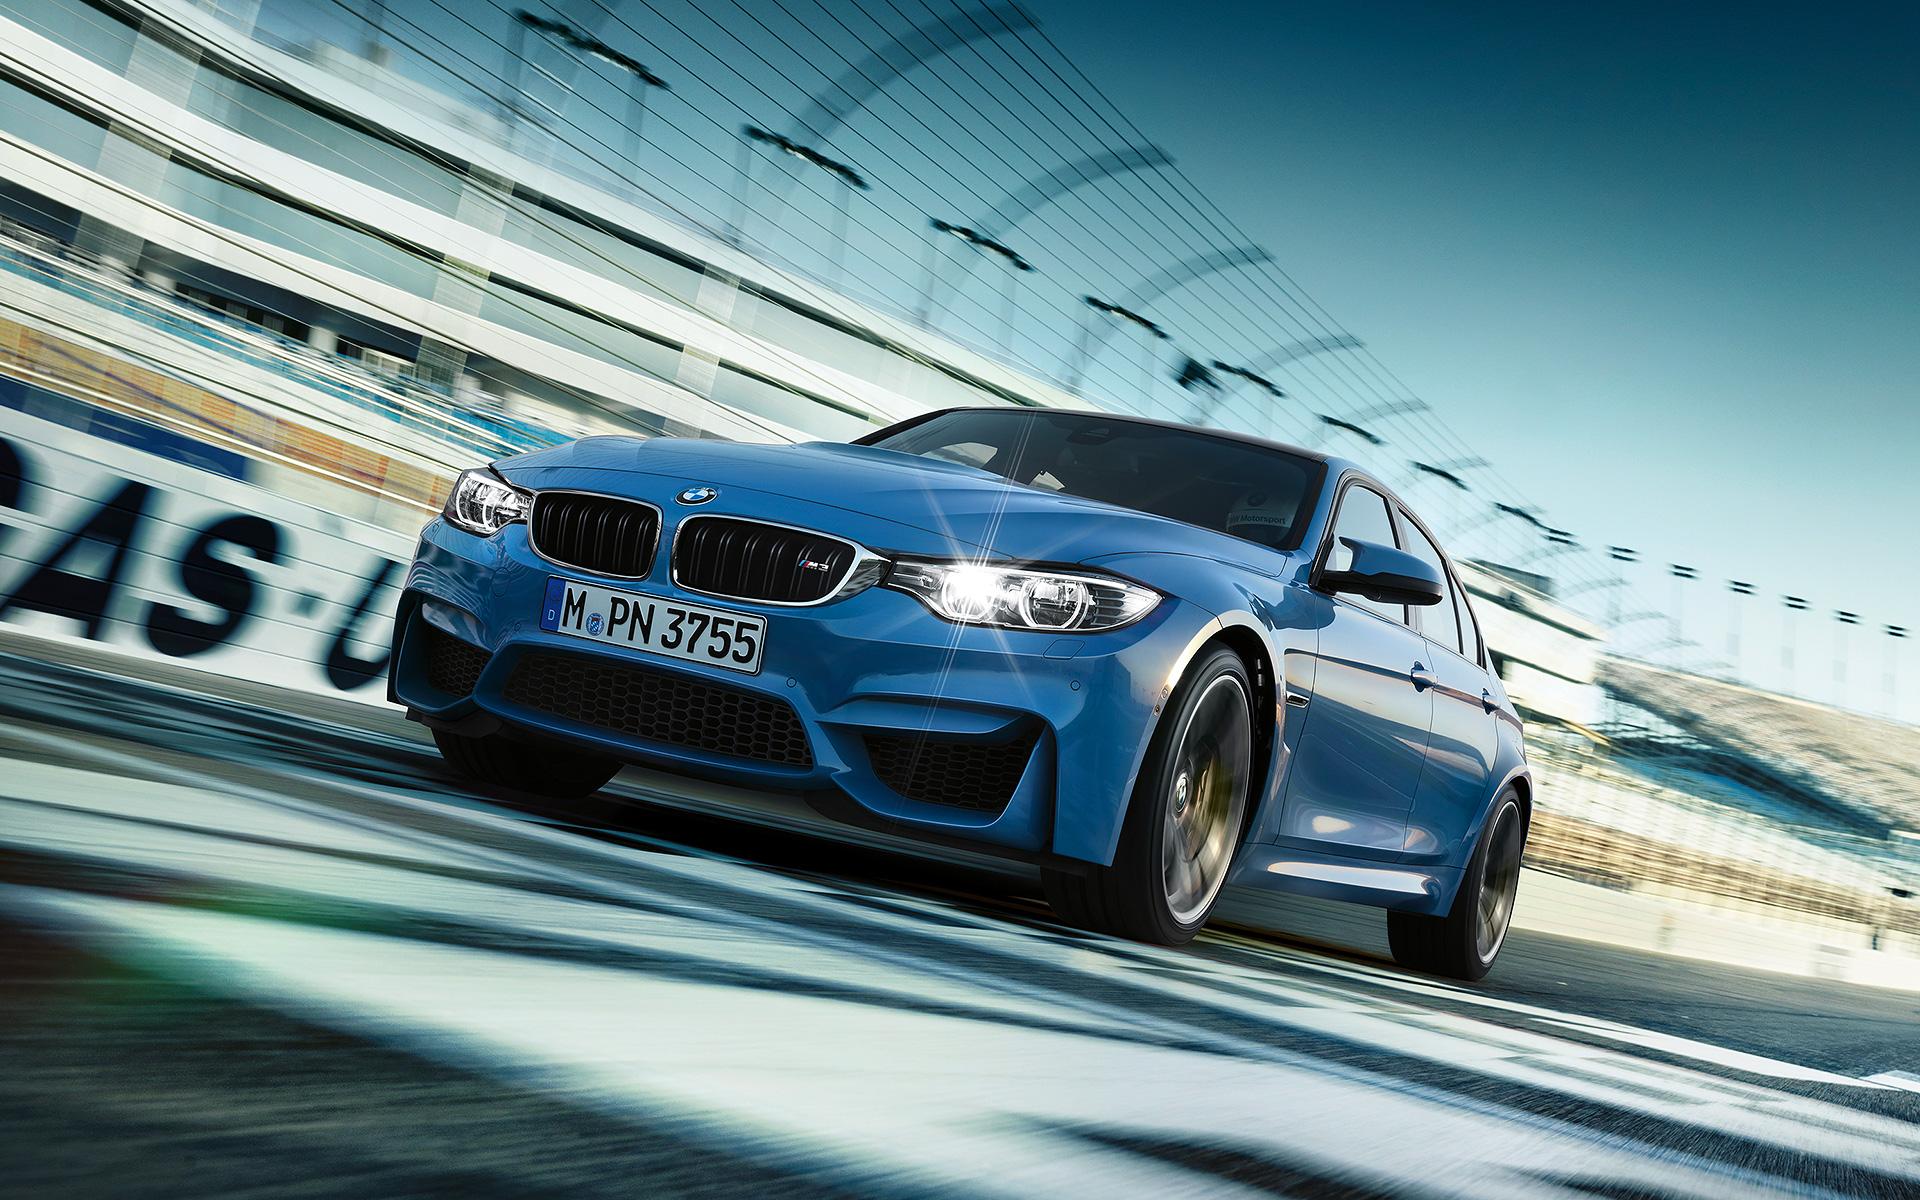 Car Drifting Wallpaper Hd 1080p Five Reasons Why Bmw Shouldn T Make An All Wheel Drive M3